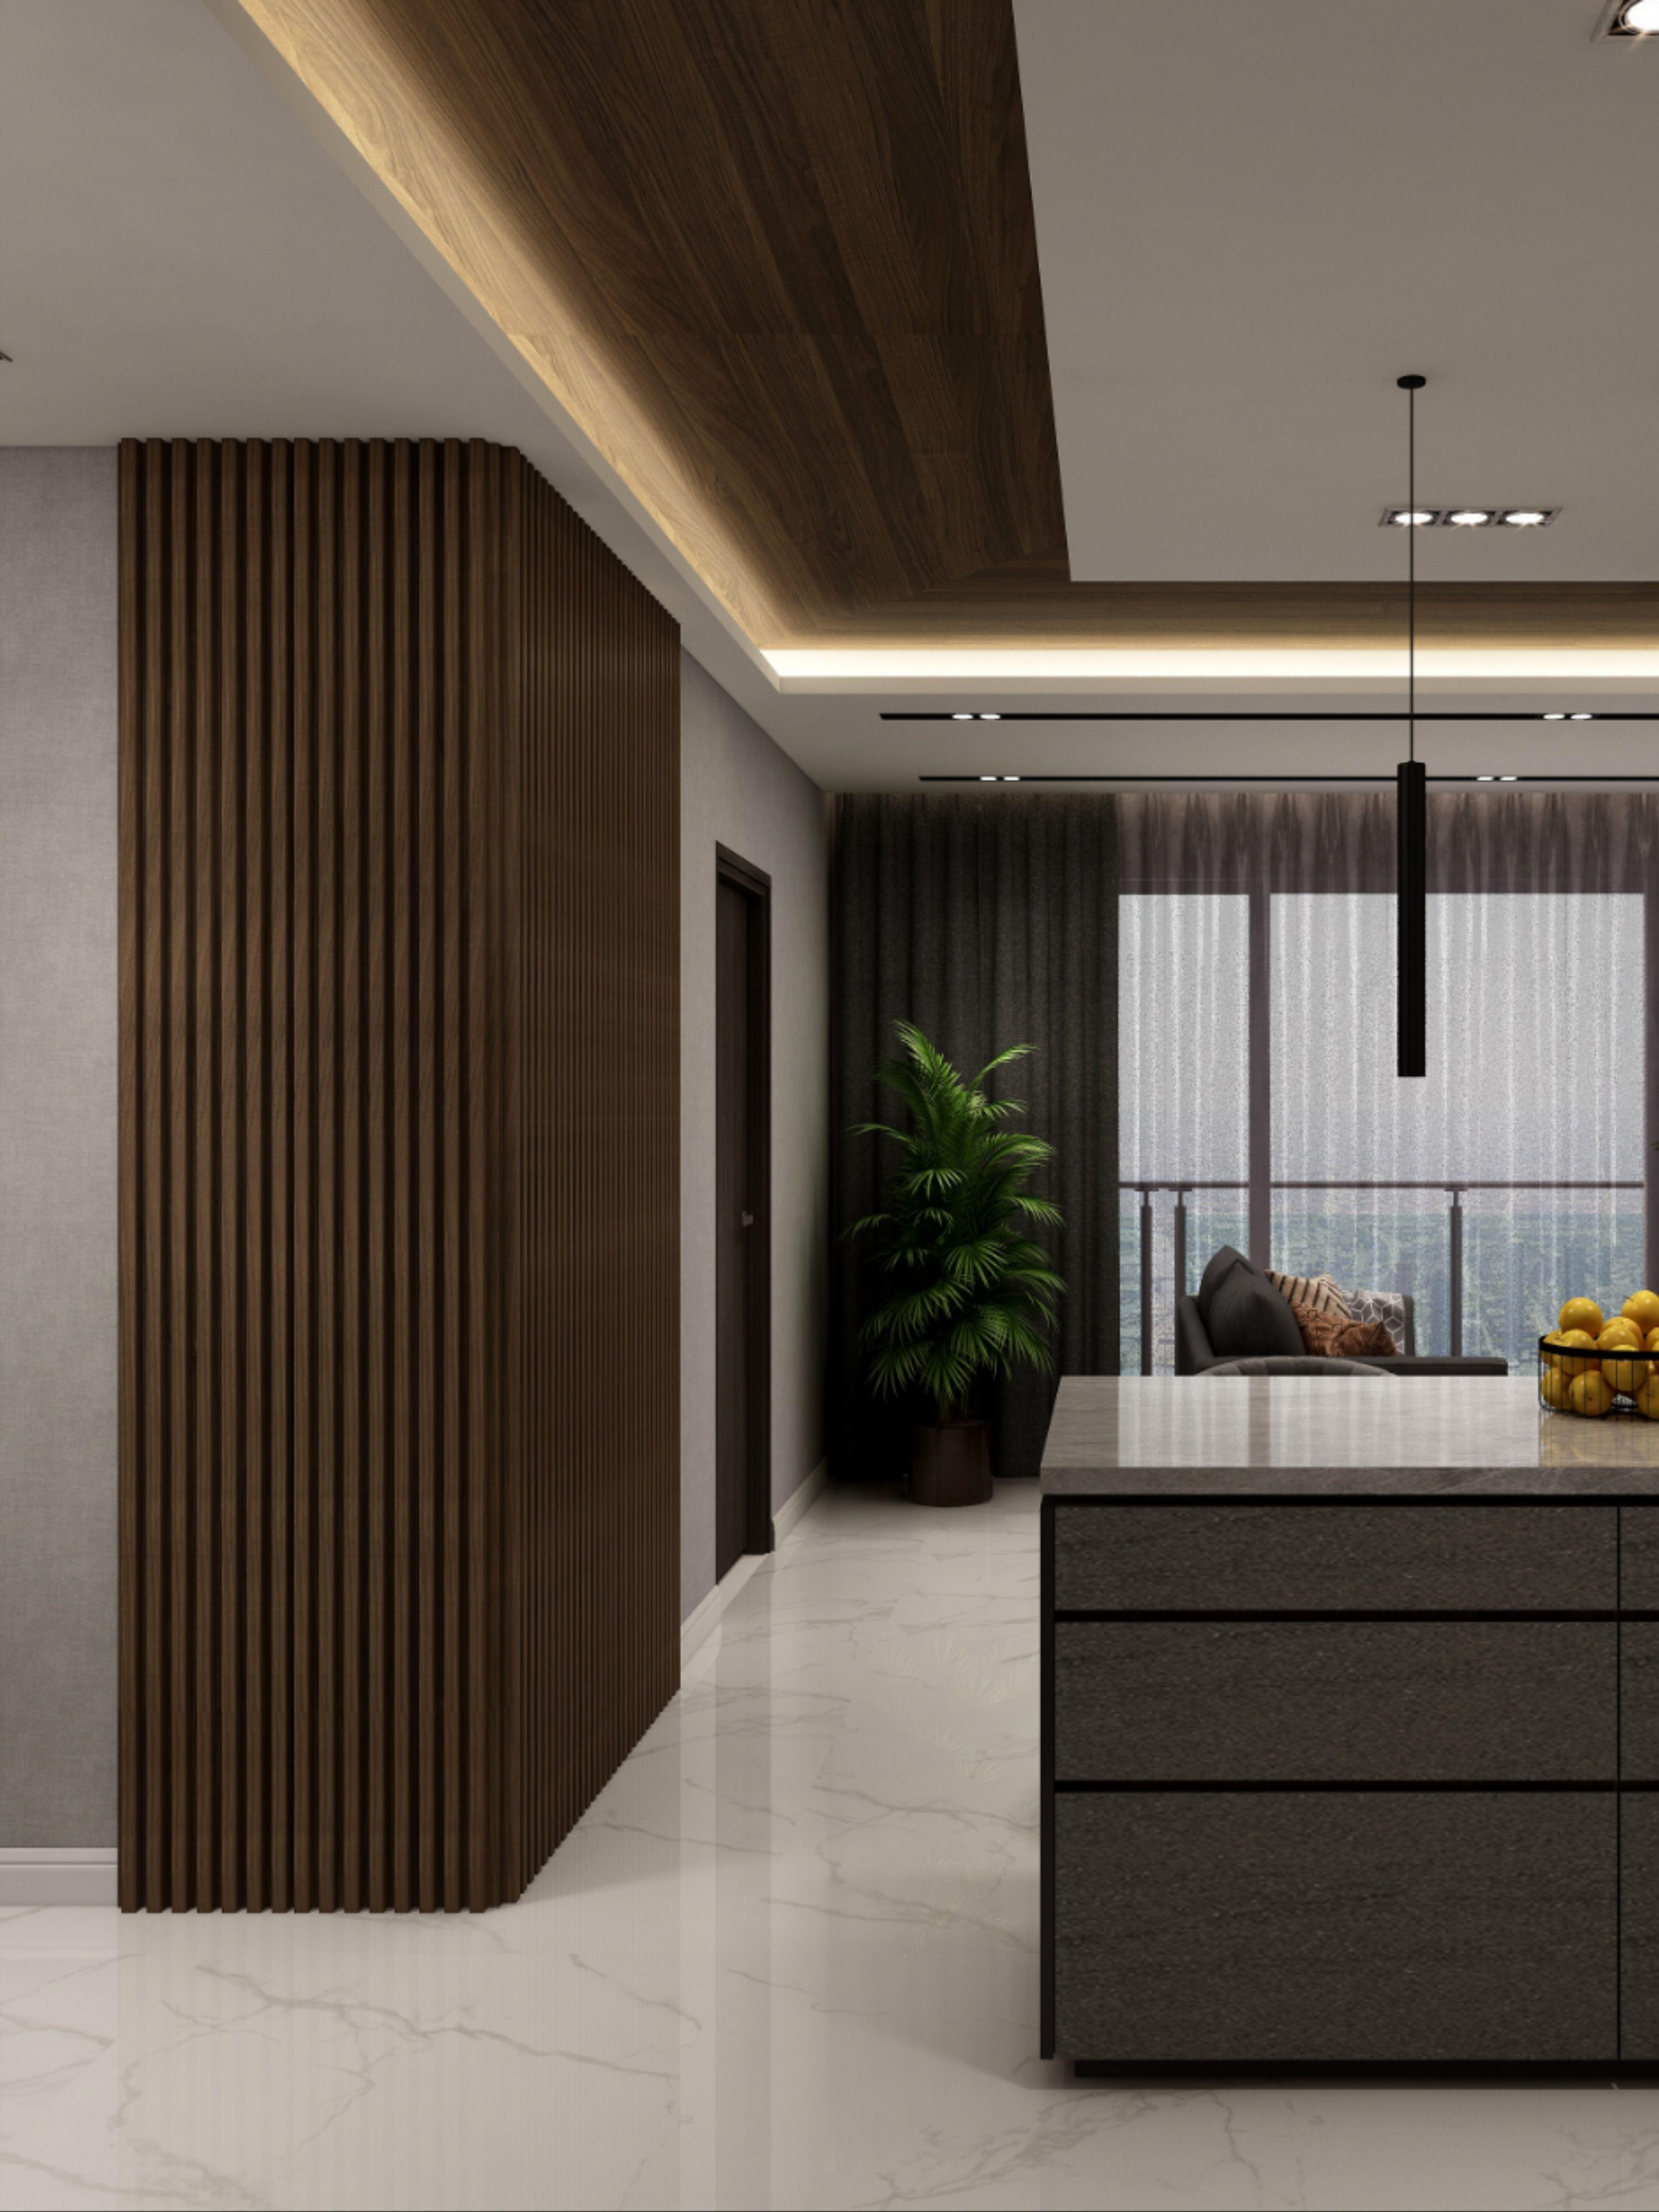 Wood Apartment Interior Design Queen S Peak Condo In 2021 Wood Cladding Interior Condo Interior Design Modern Wall Paneling